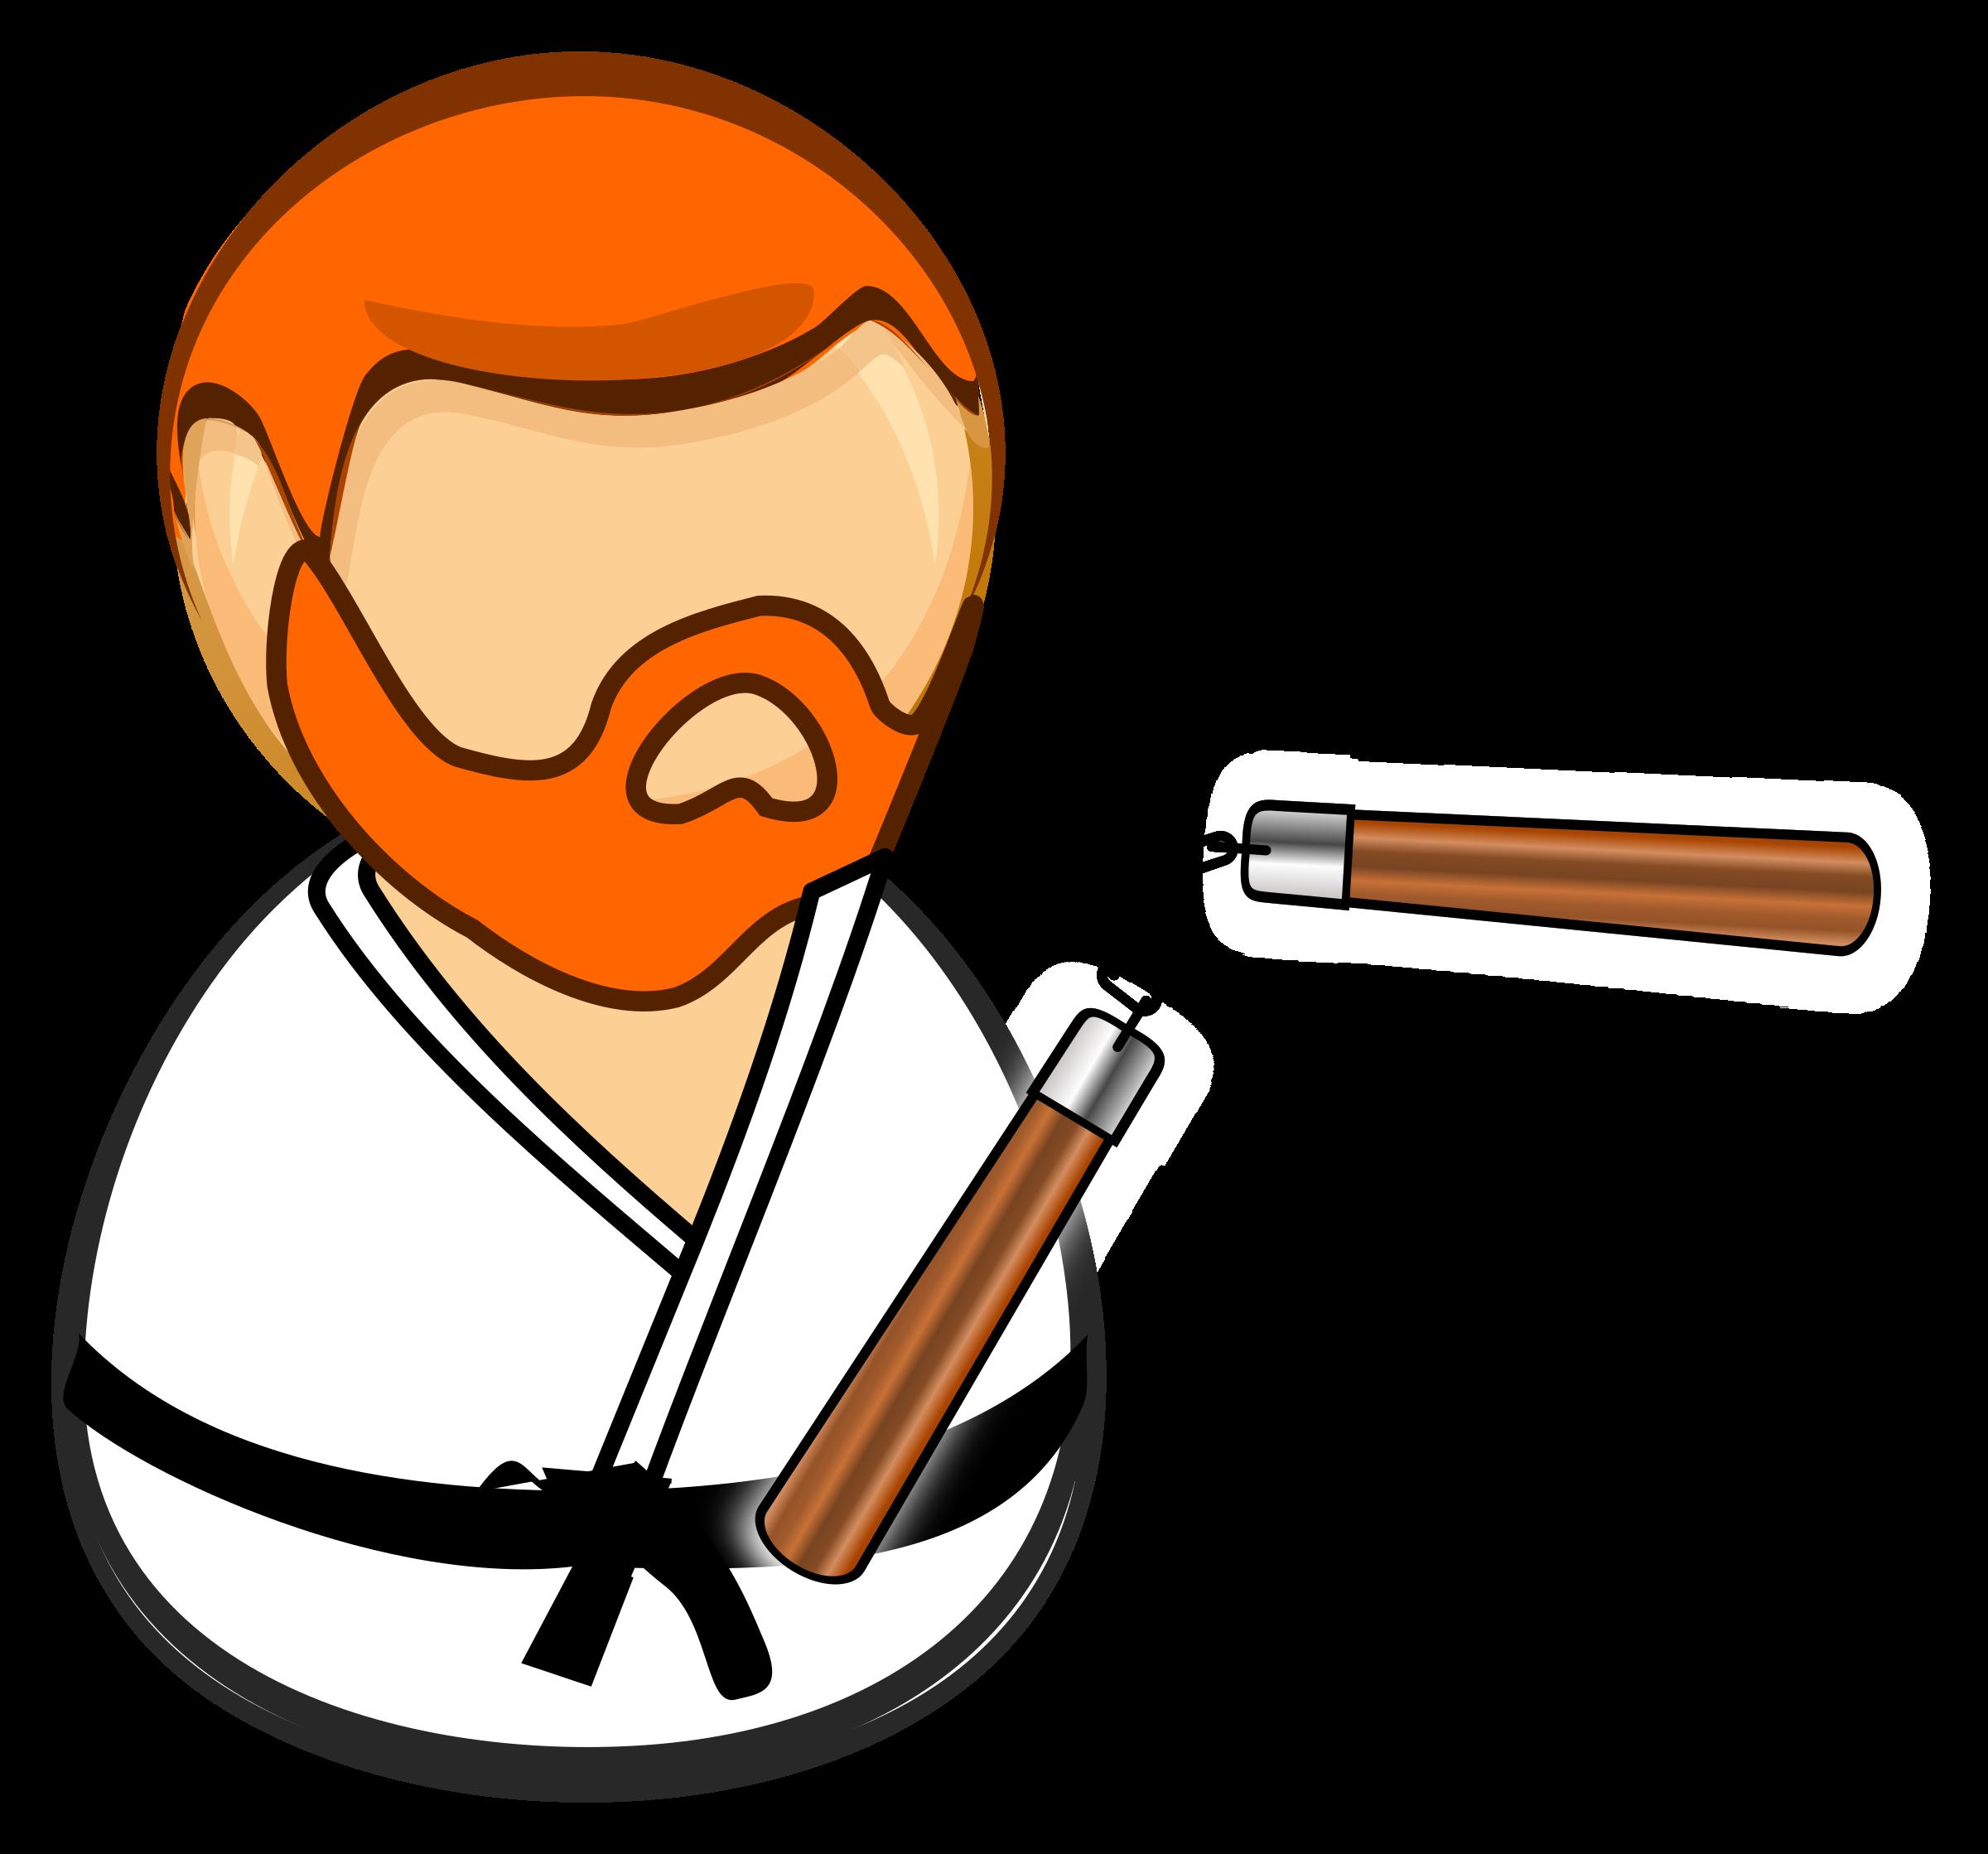 Cartoon baseball player clipart freeuse Cartoon Baseball Clipart#4403148 - Shop of Clipart Library freeuse